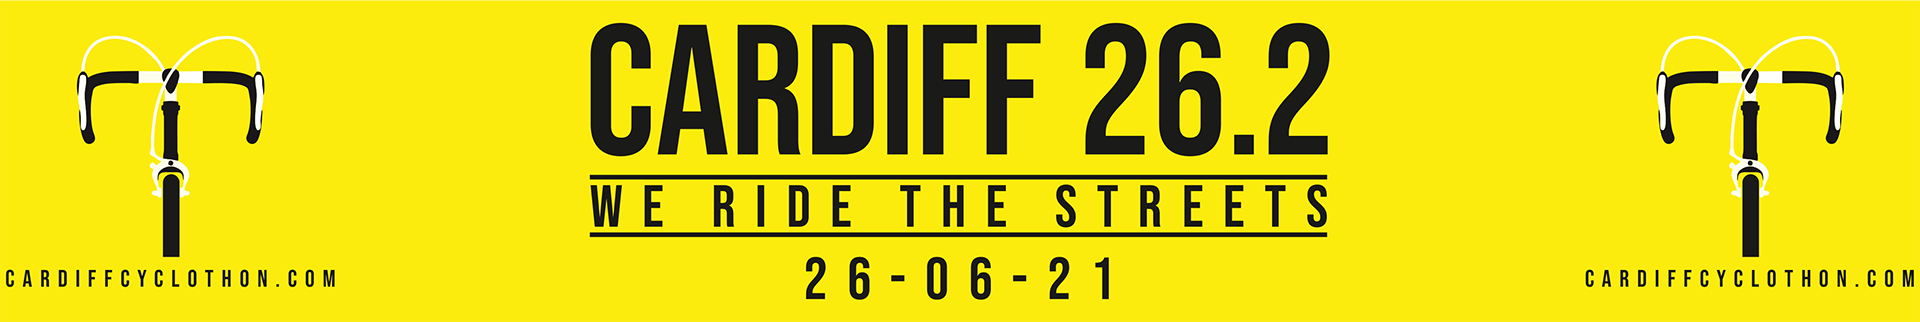 #CardiffCyclothon